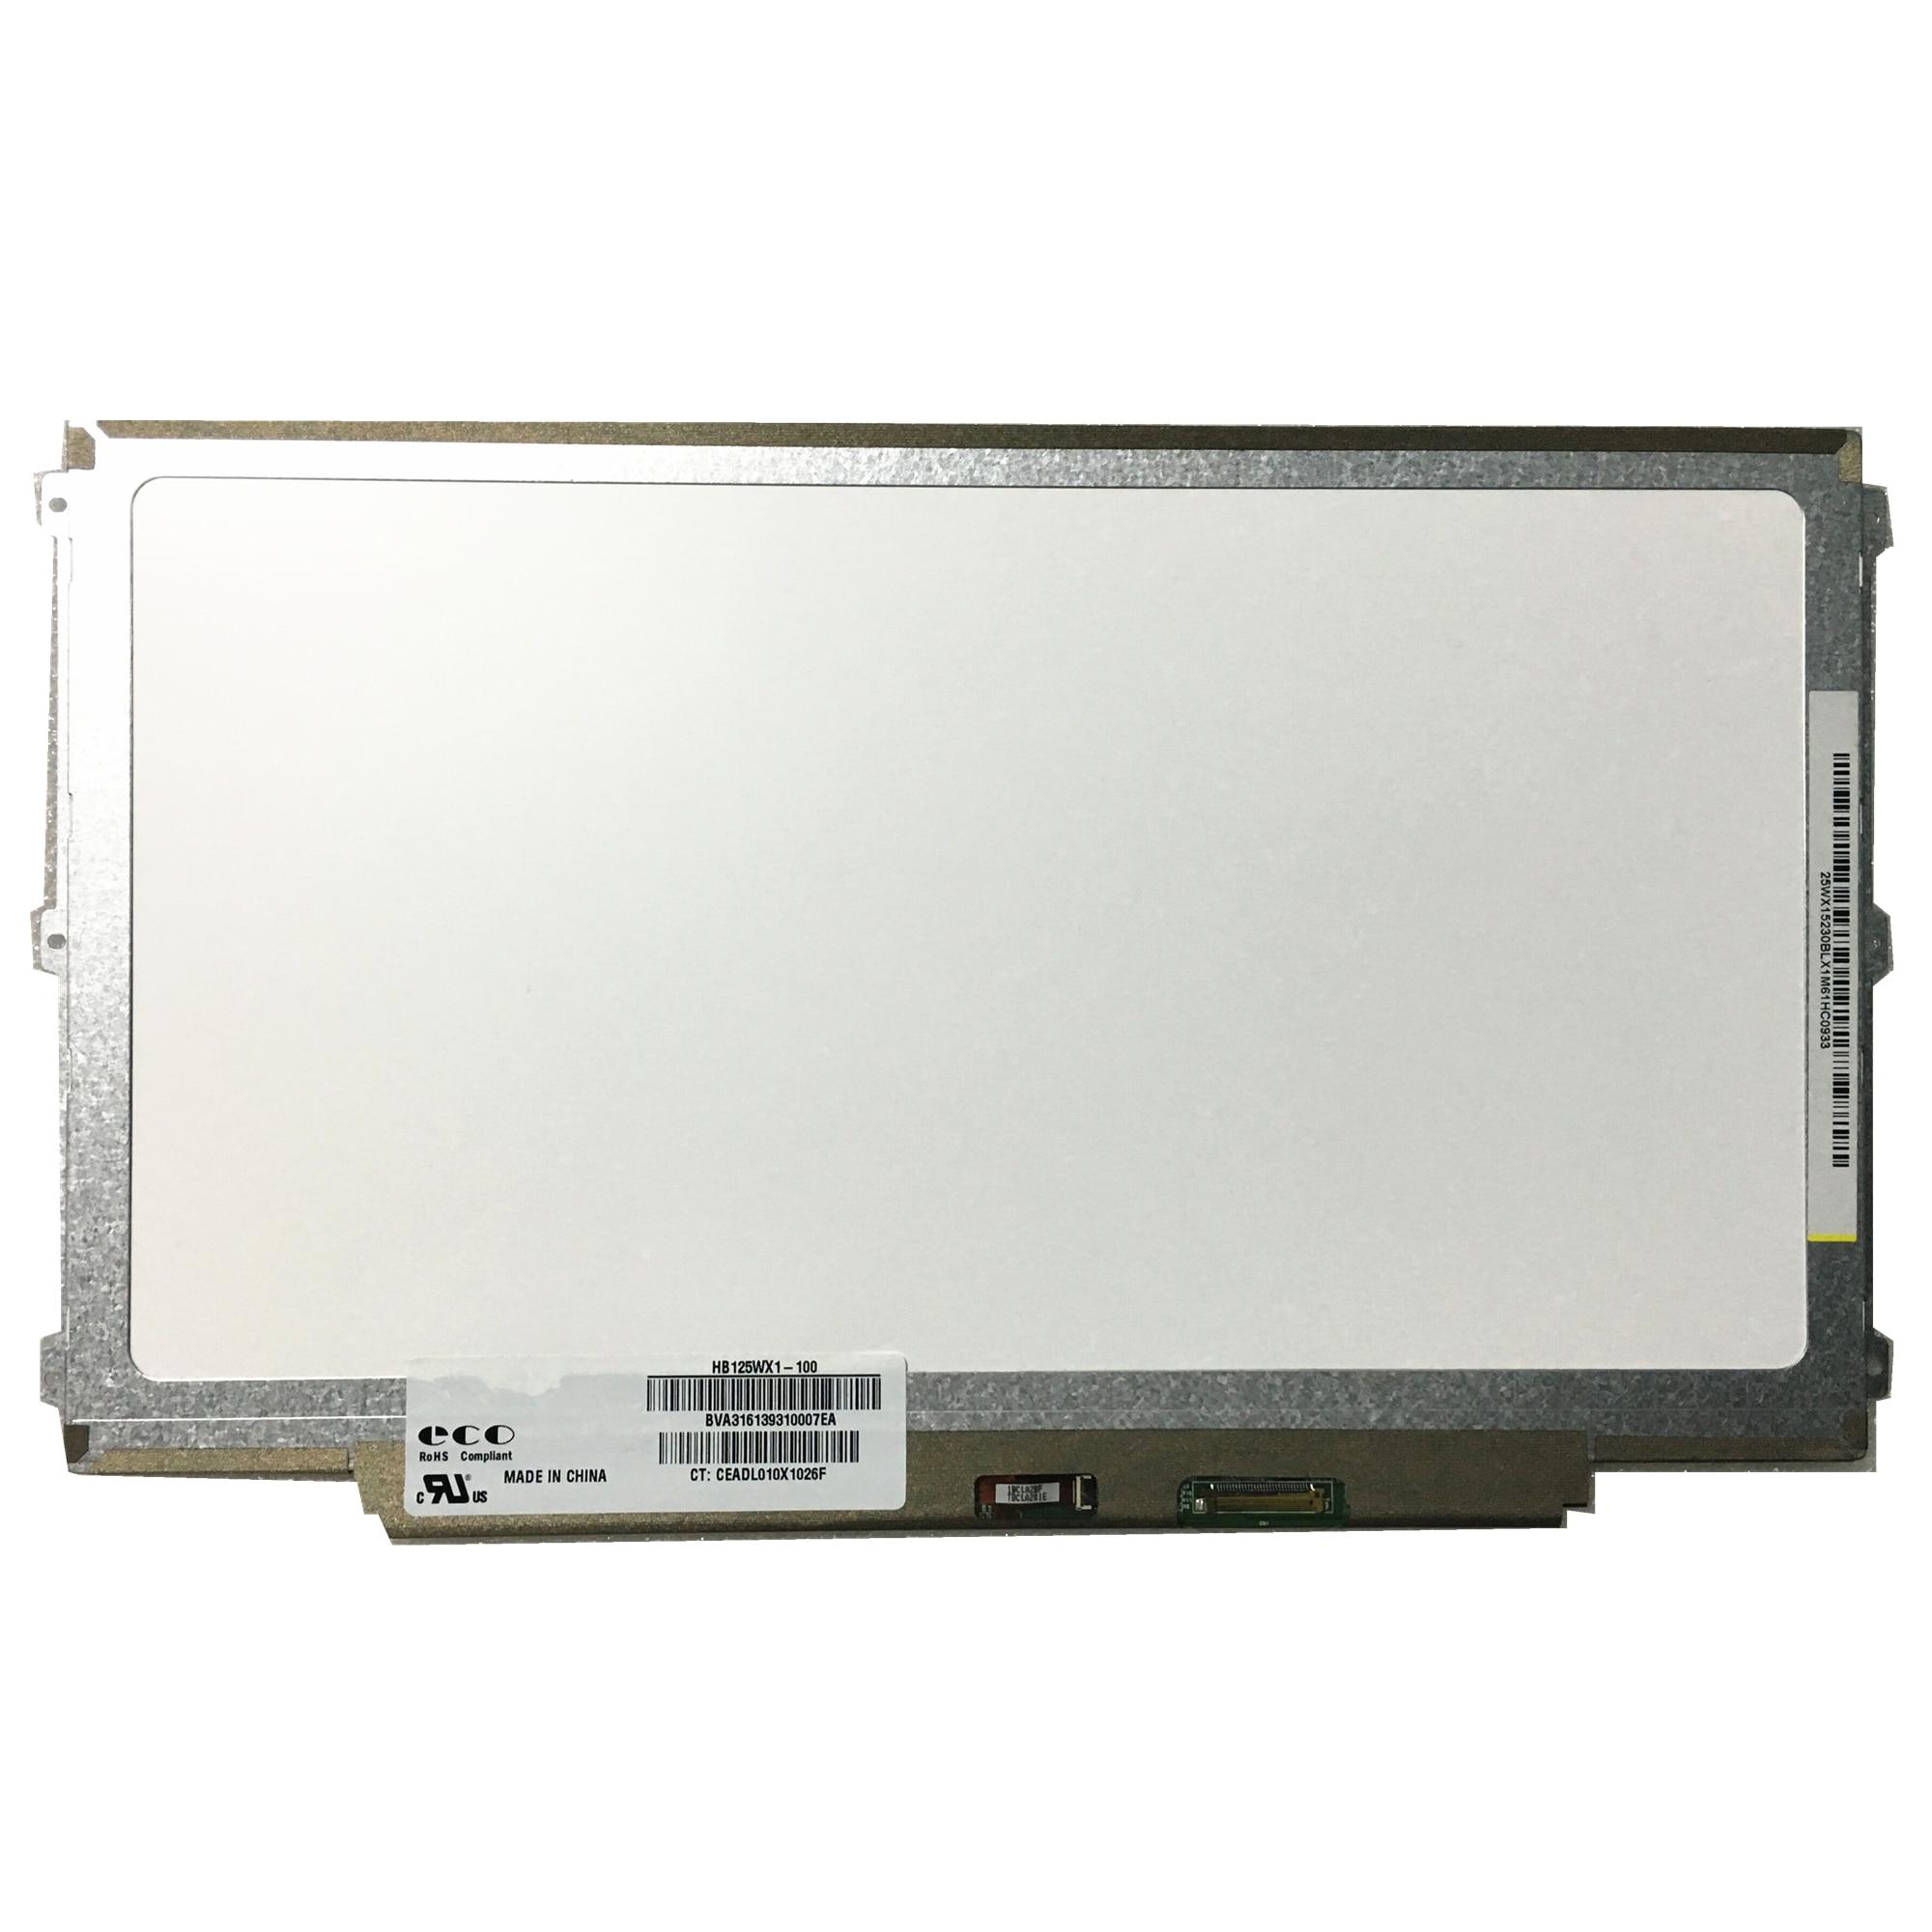 Lp125wh2-tpb1 para Dell g2 Tela Lcd 1366*768 Edp 30 Pinos Hb125wx1-100 Hb125wx1-201 E7240 hp 820